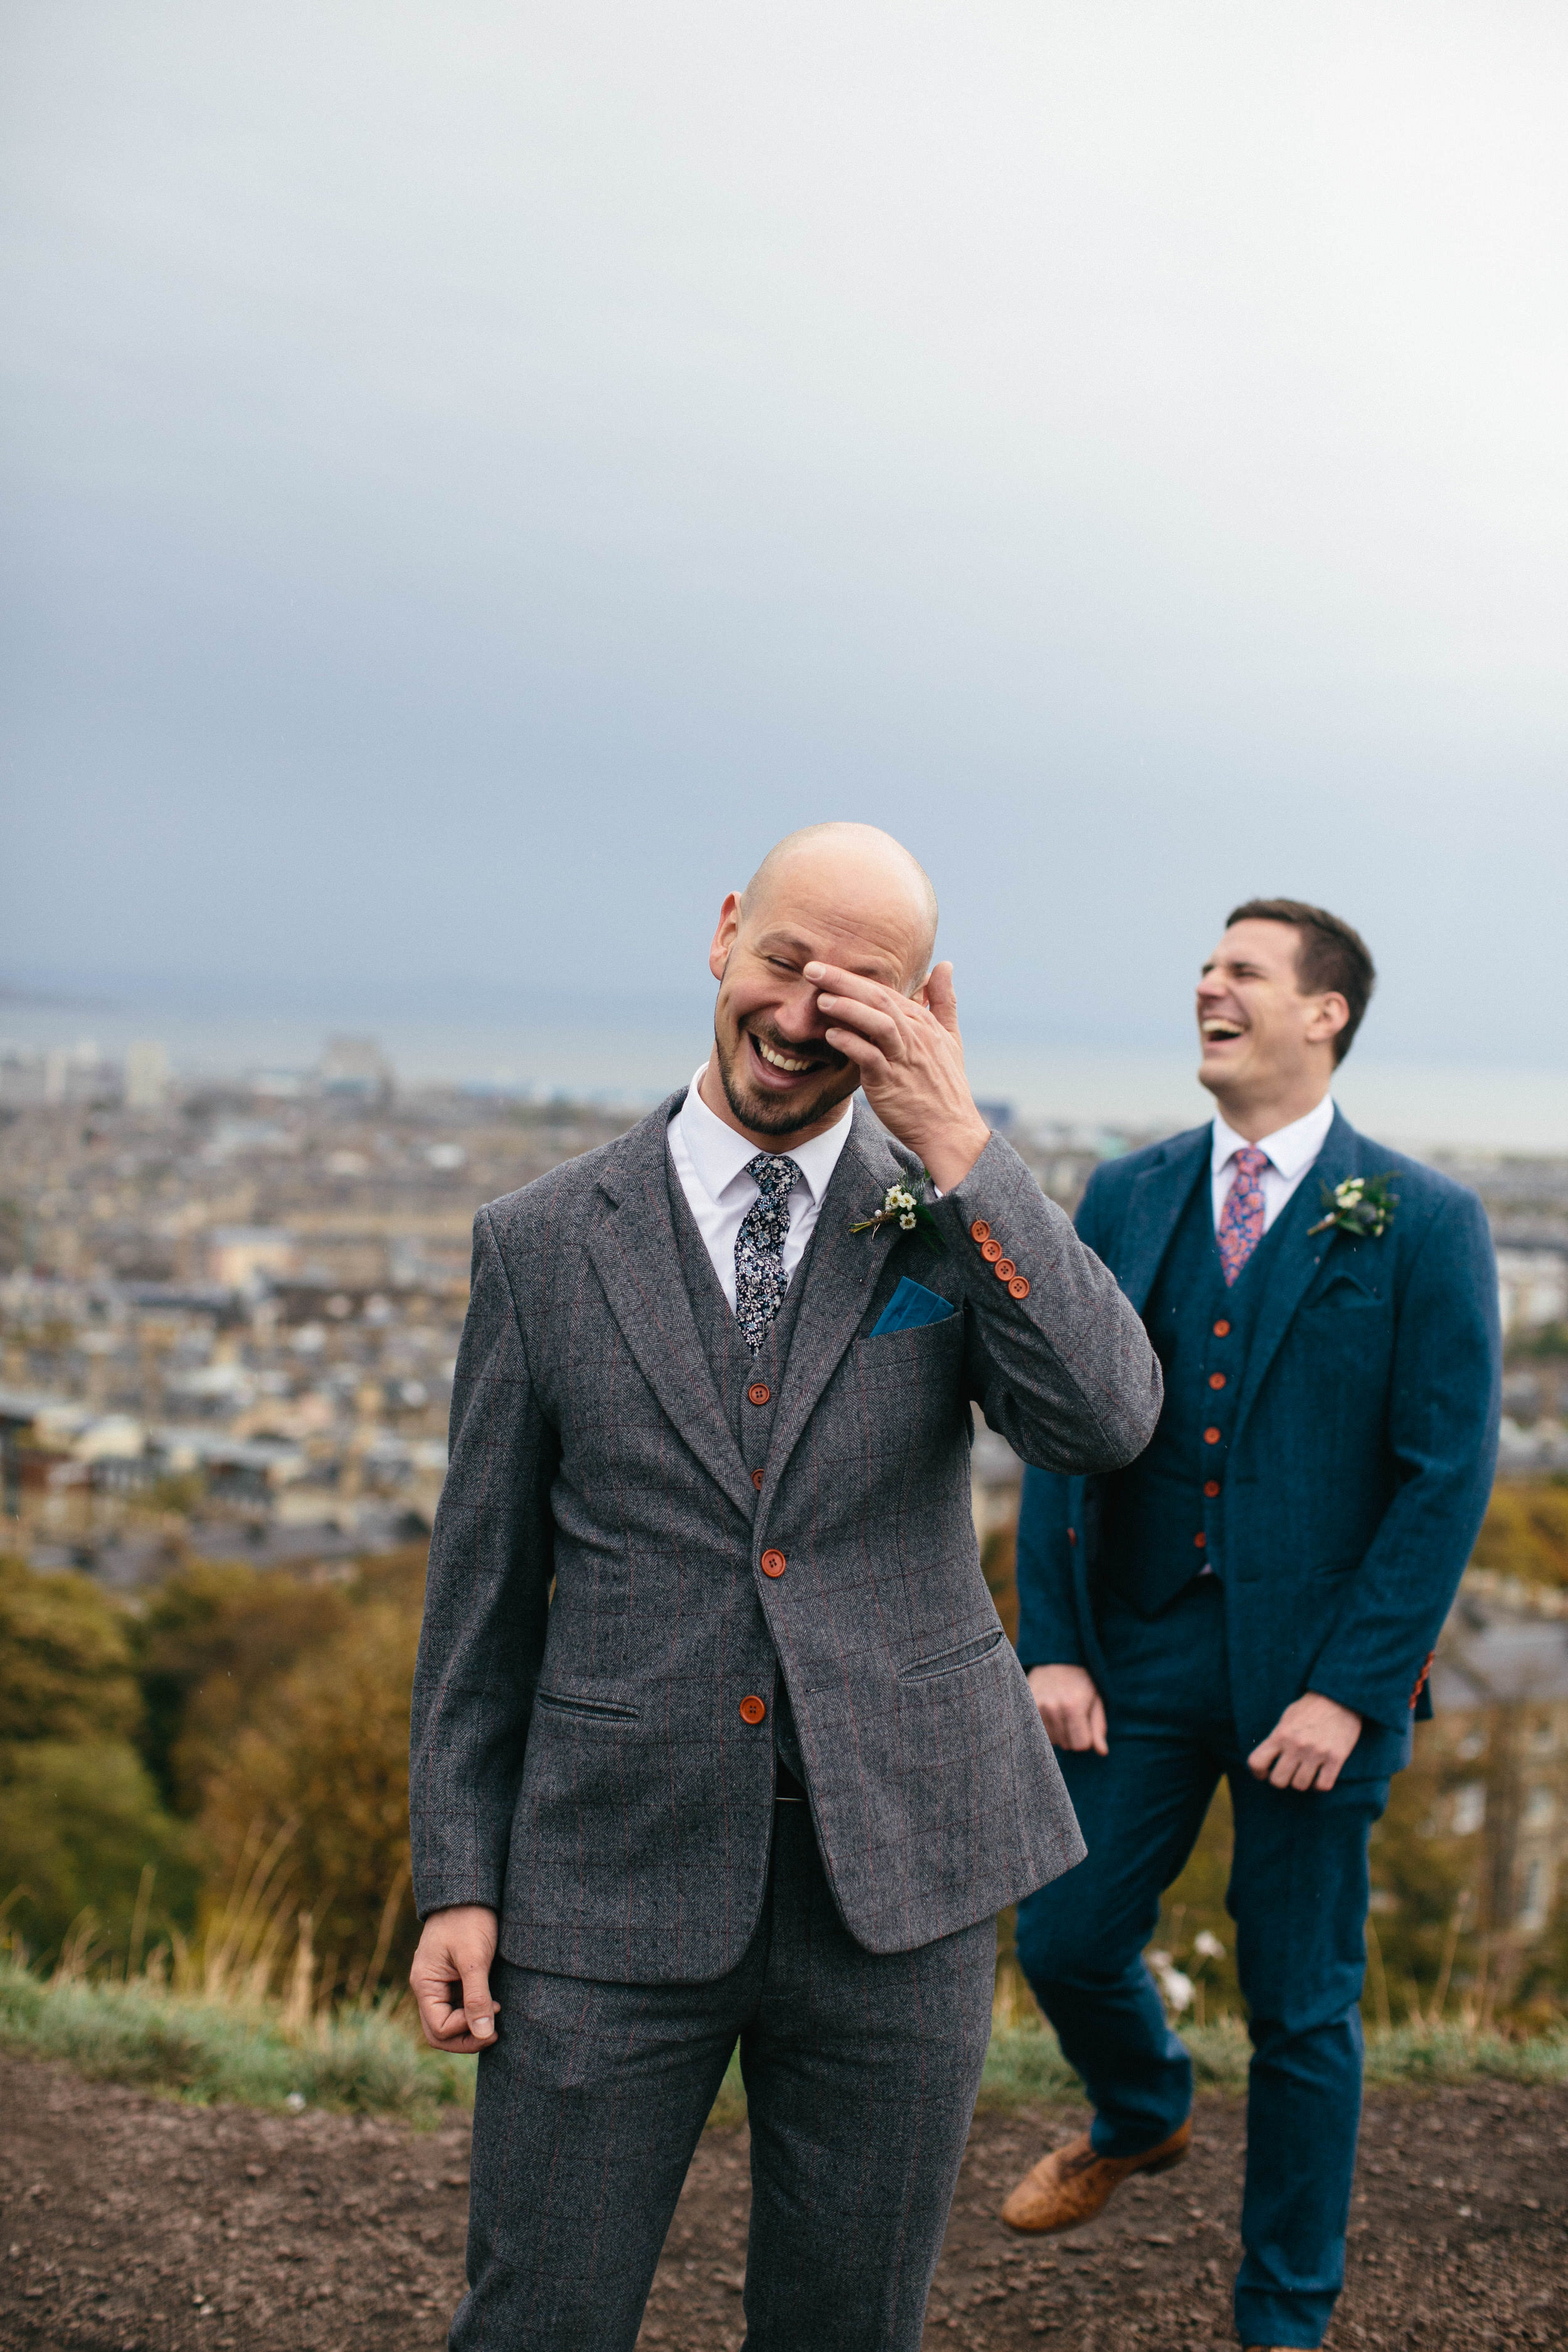 Quirky Wedding Photographer Scotland Glasgow Edinburgh Mirrorbox 118.jpg